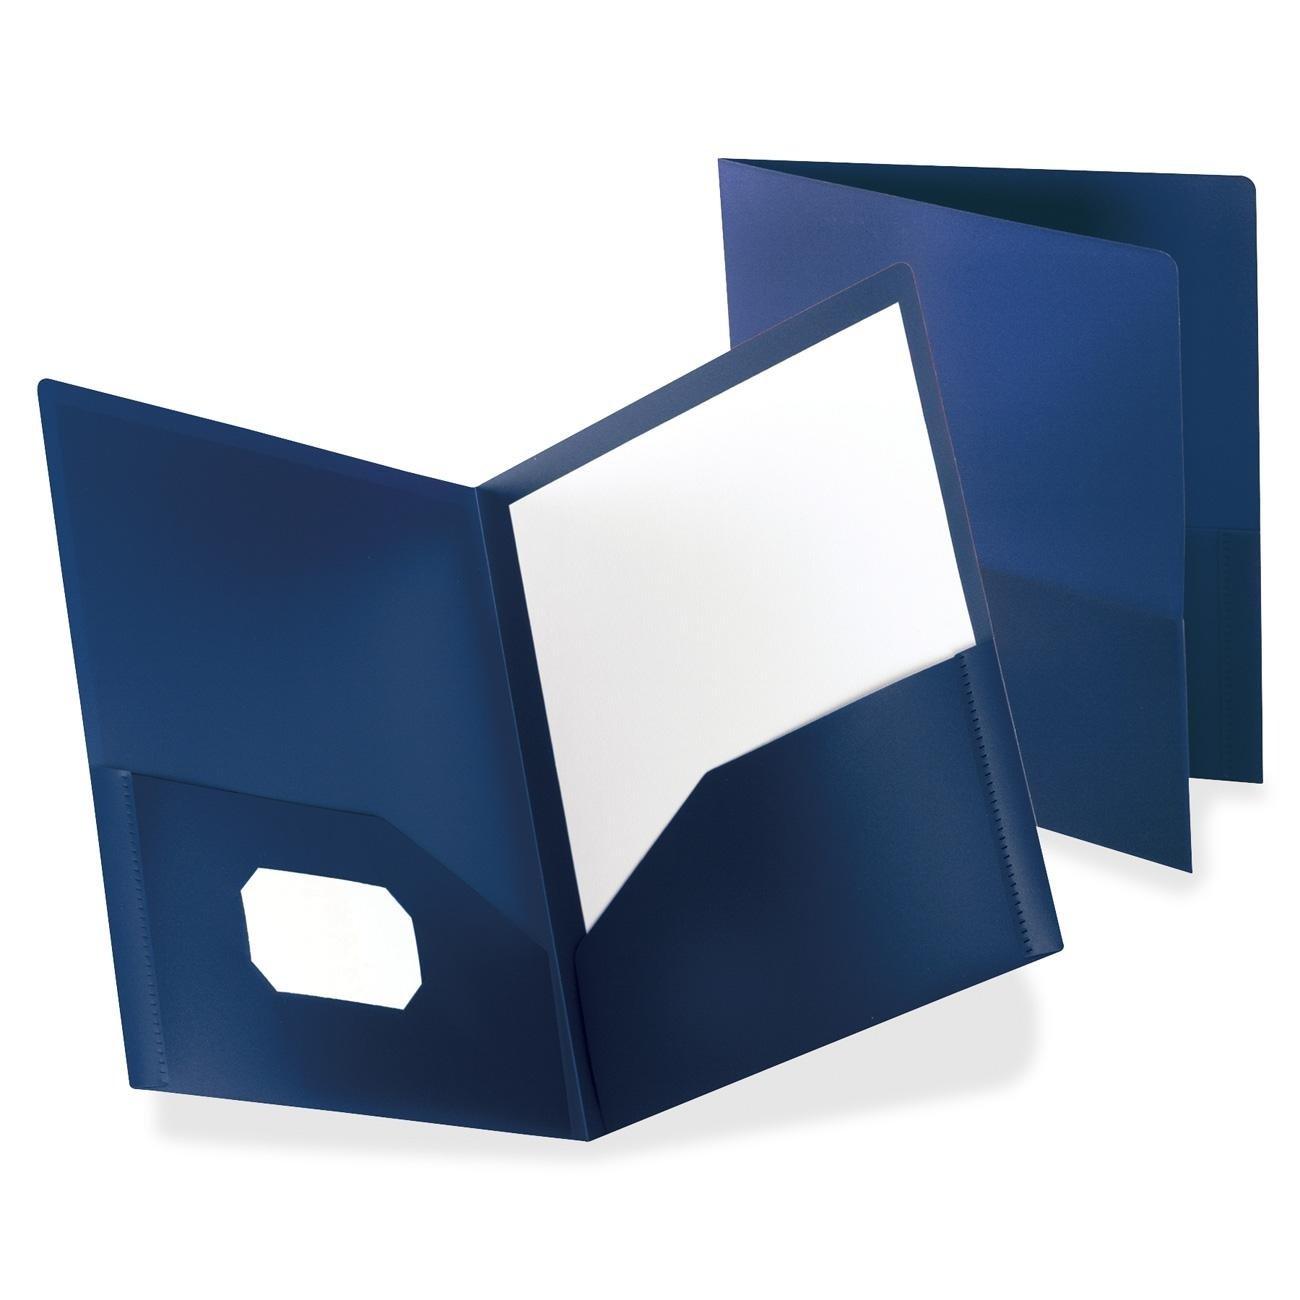 Amazon.com : Oxford Poly Twin Pocket Folders, Letter Size, Dark ...